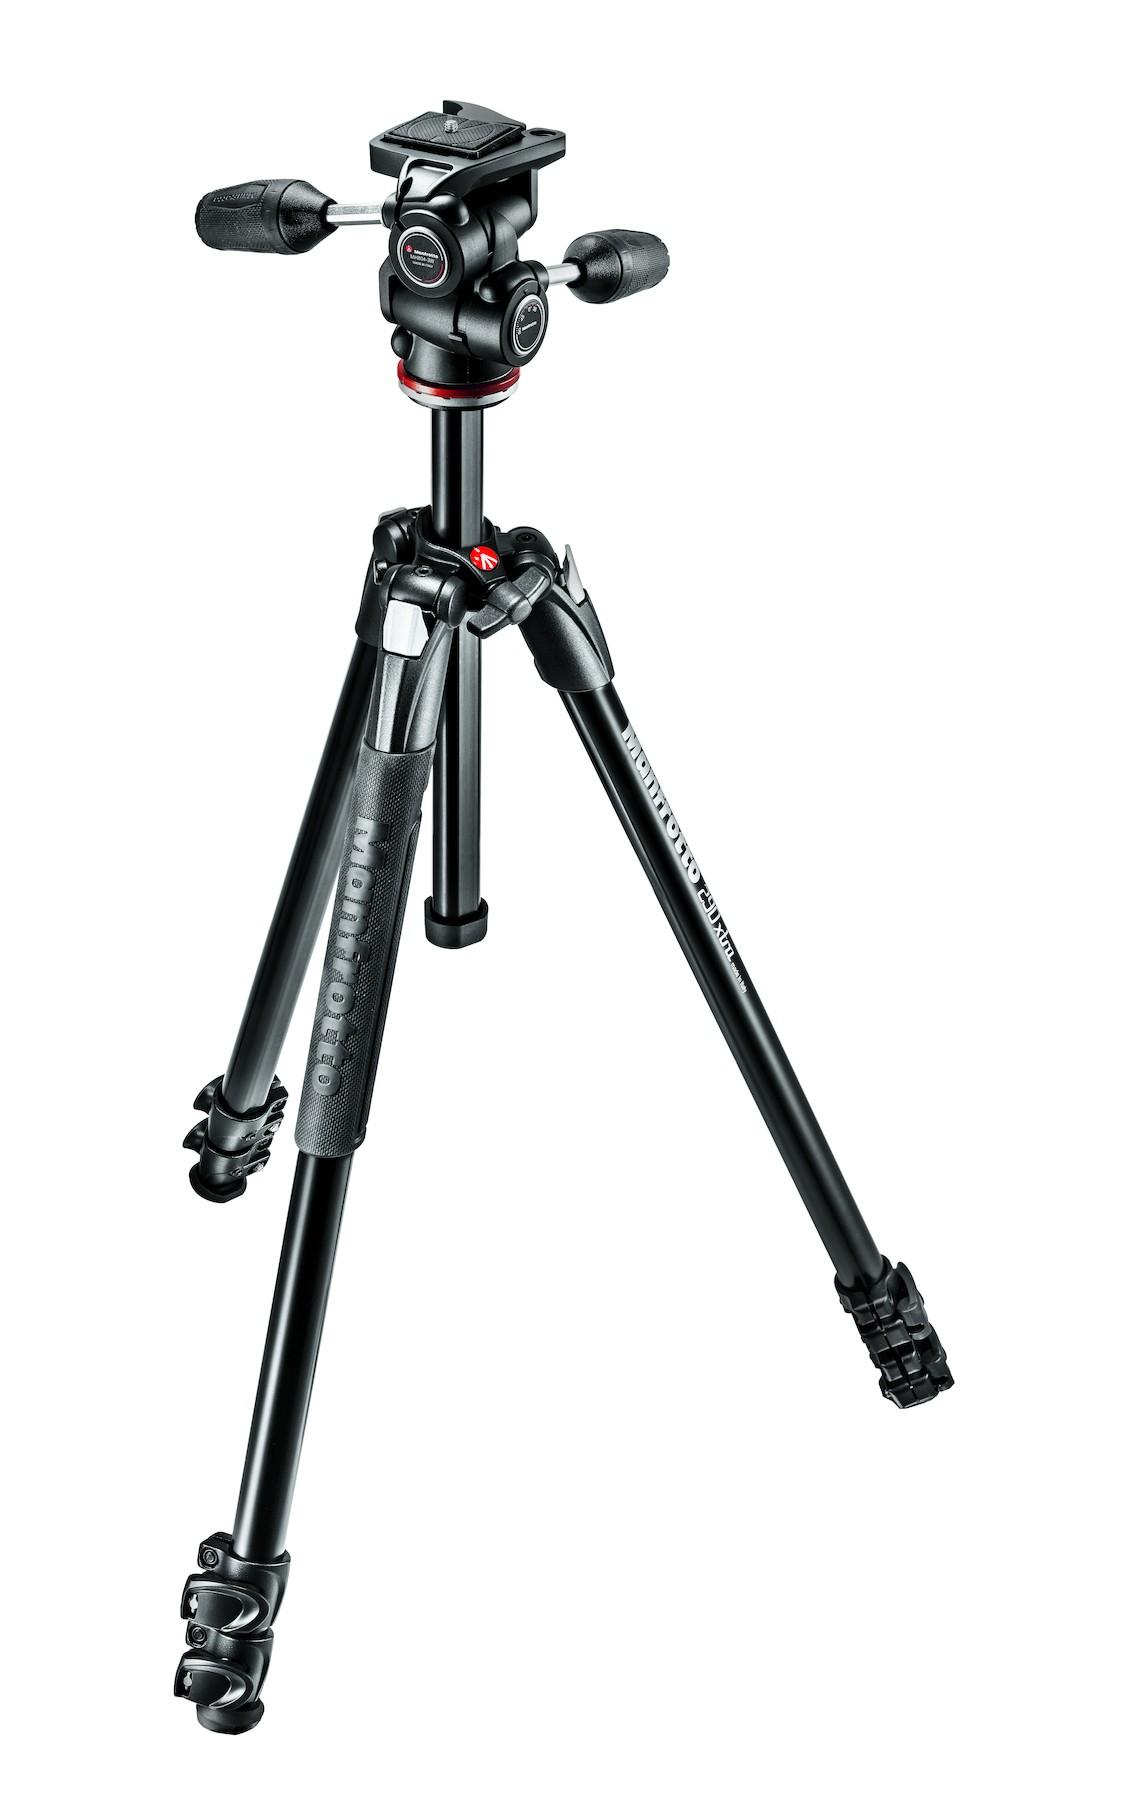 Manfrotto MK290XTC3-3WUS Tripod Camera Stand Instant Rebate